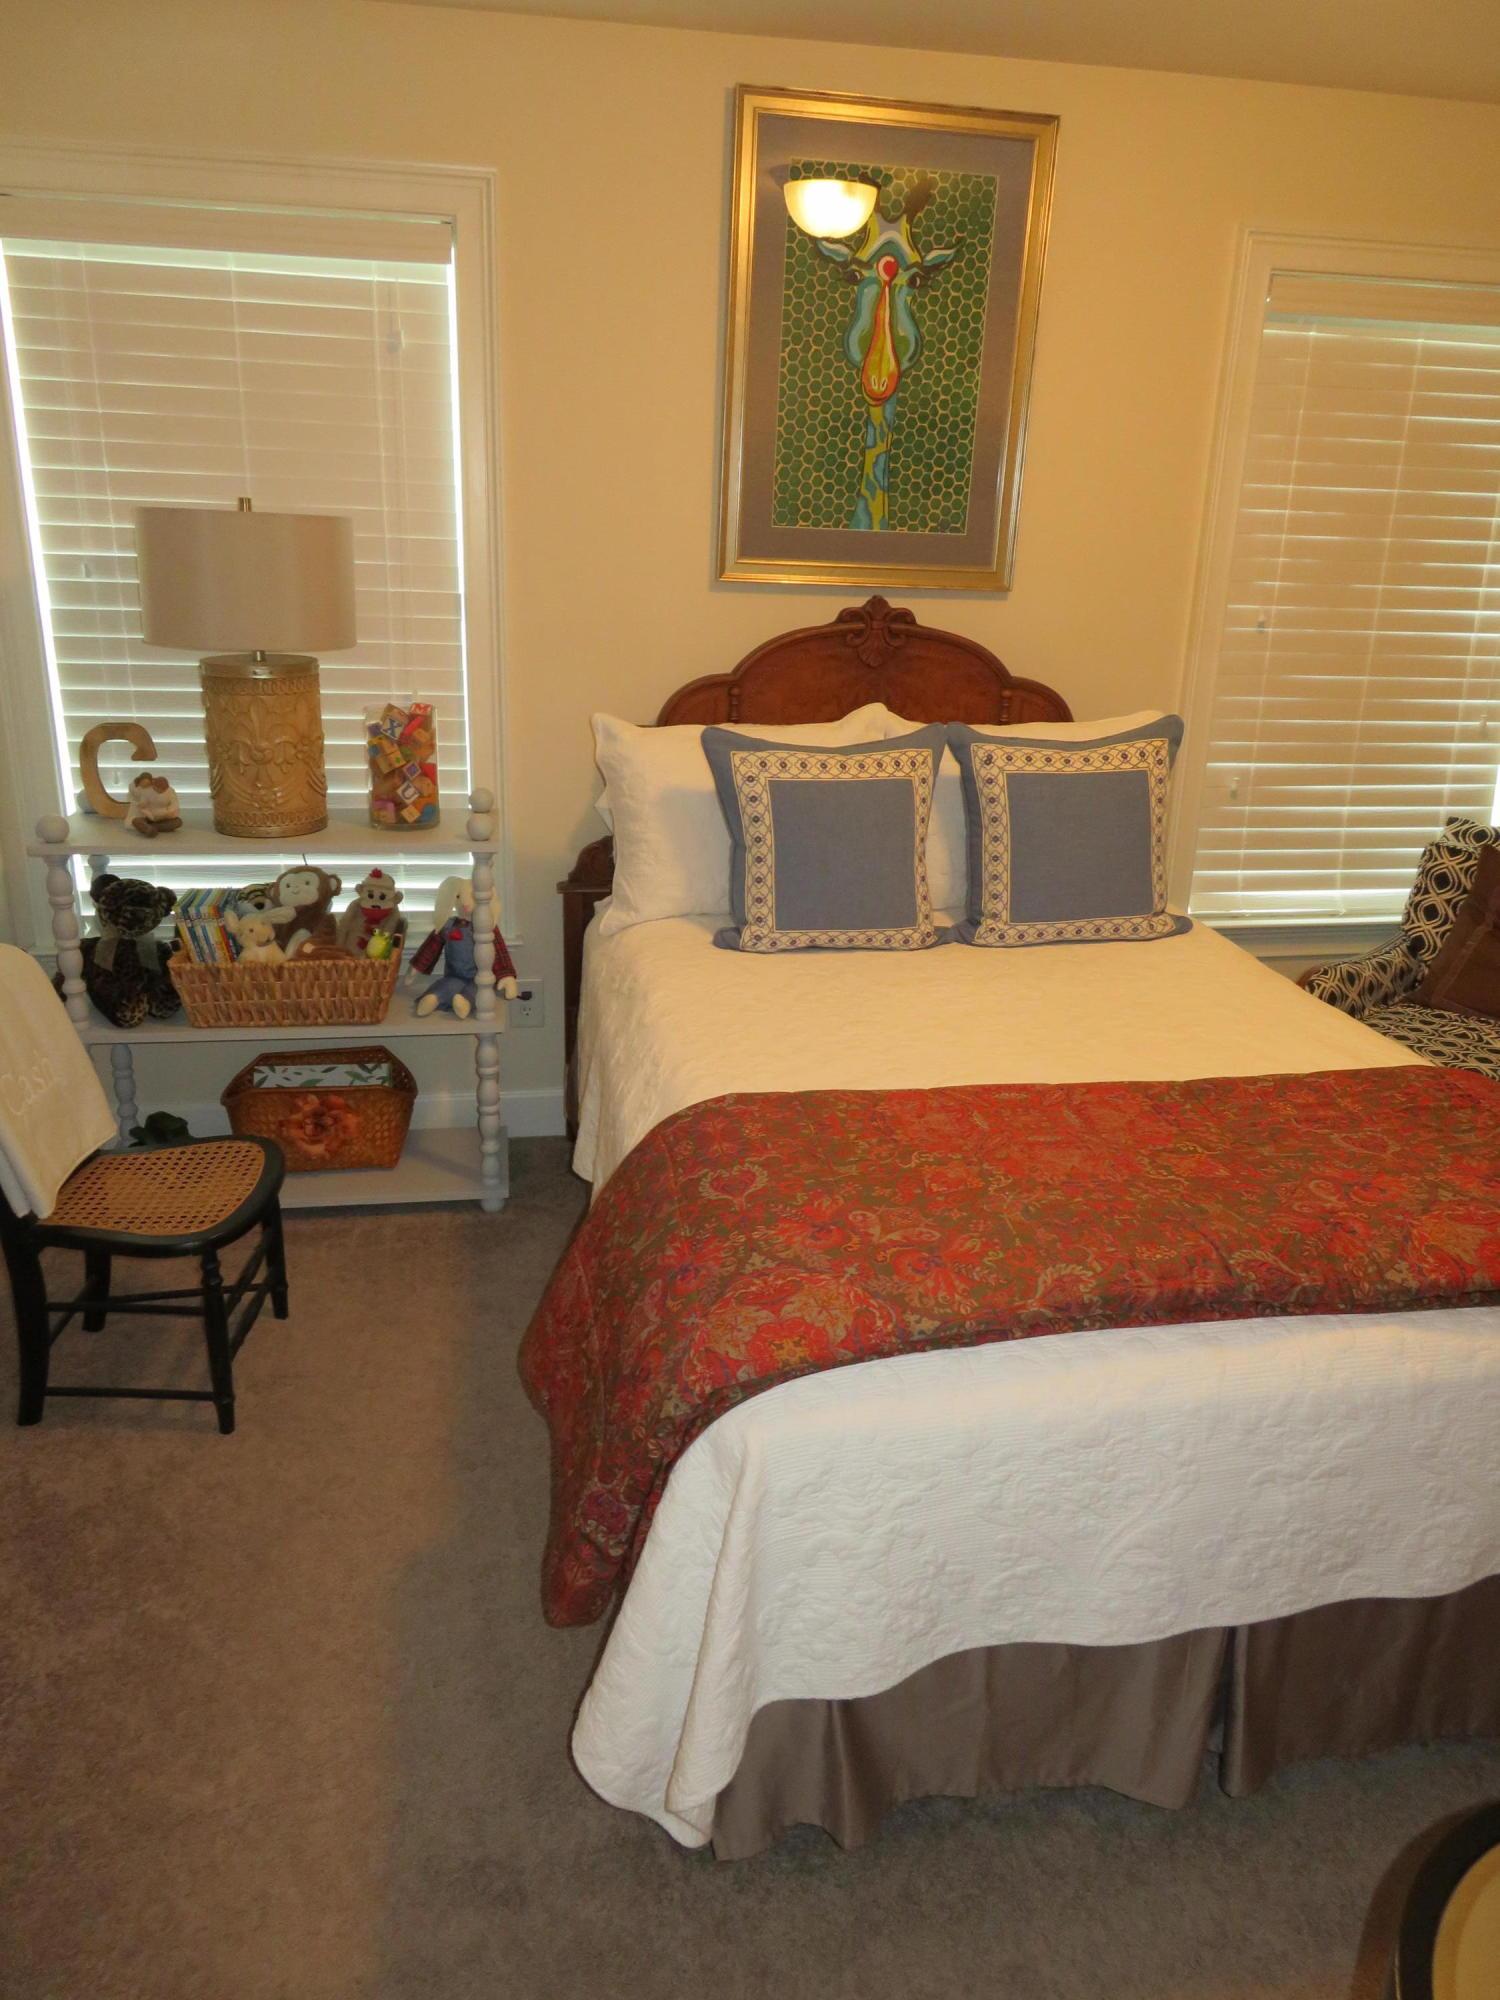 Hillside Farms Homes For Sale - 114 Danielle, Summerville, SC - 34